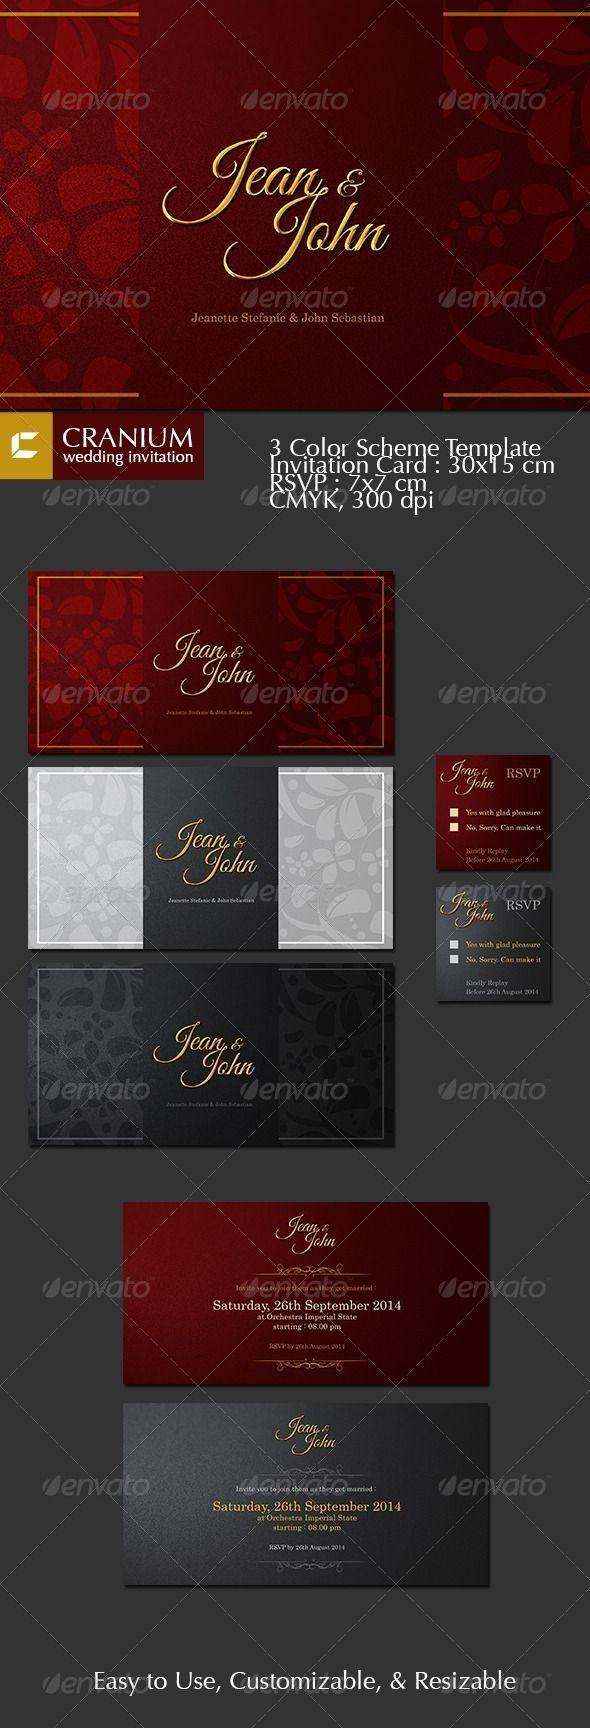 Wedding Invitation Template & Design #Invitation #WeddingCard ...